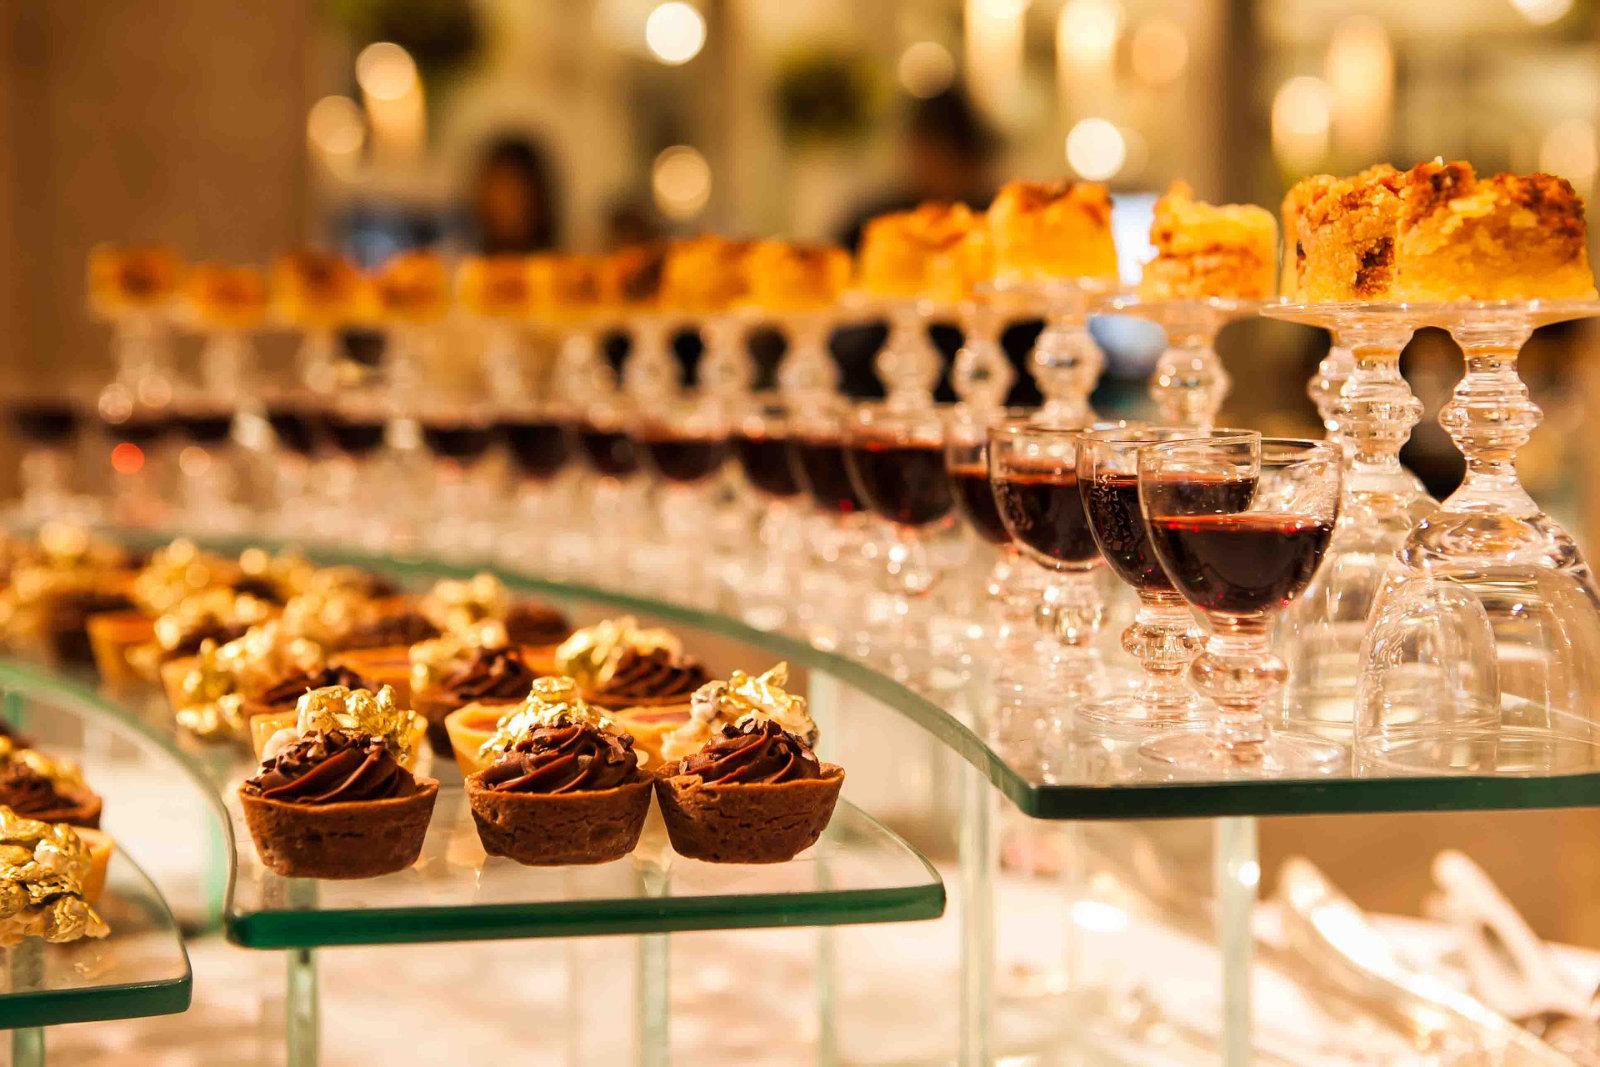 desserts-port-glasses.jpg